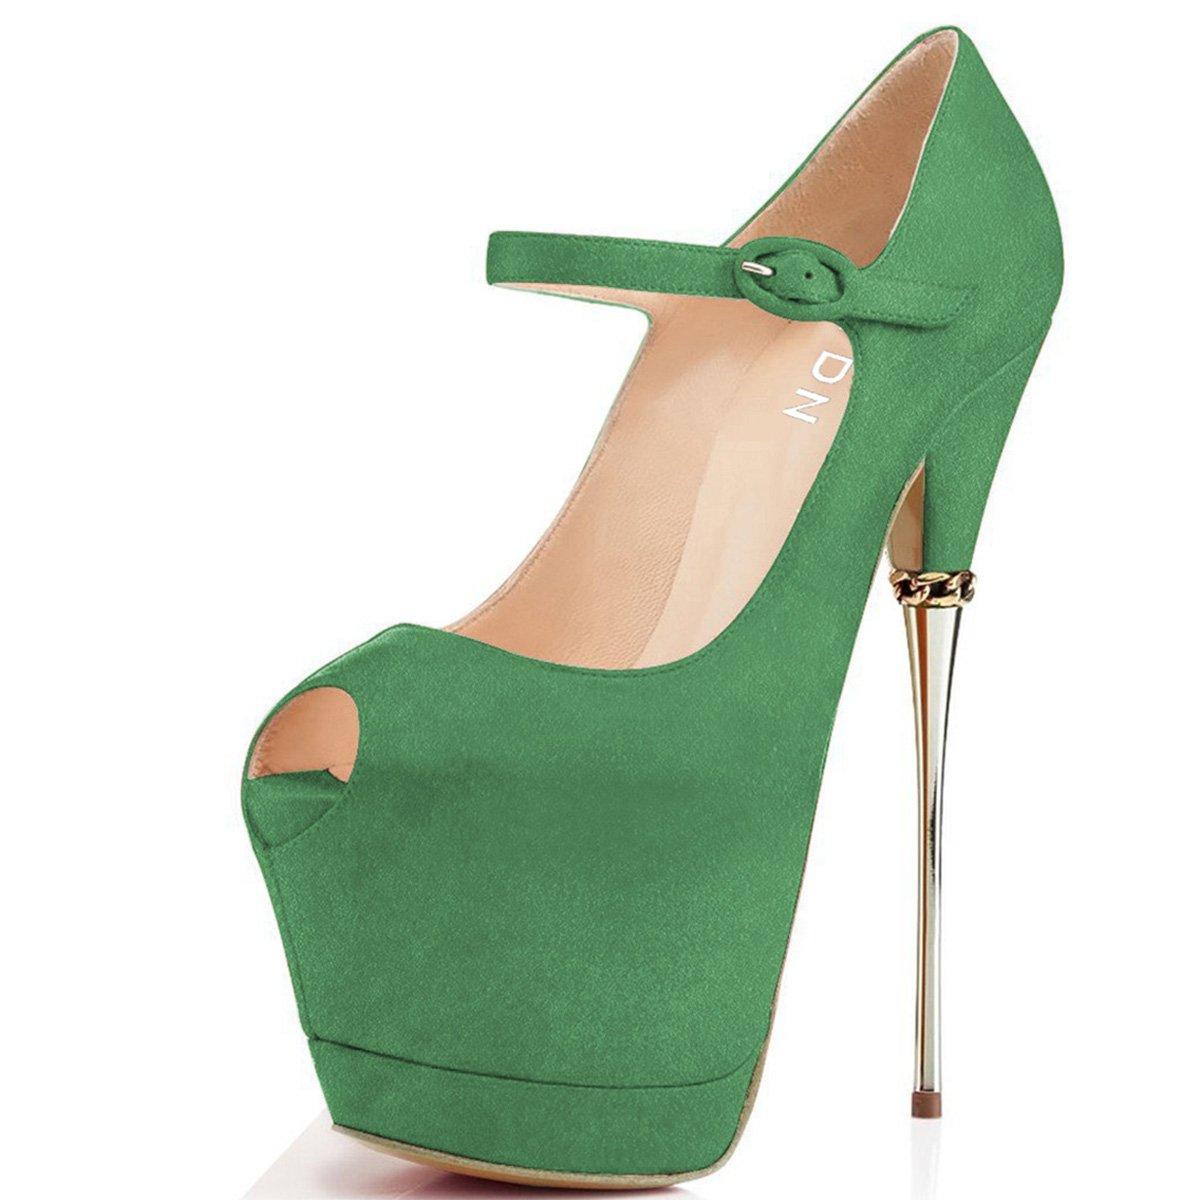 YDN Women Peep Toe Sky High Heels Platform Pumps Ankle Straps Shoes Metal Stilettos B07B7HJZR7 4 M US|Green